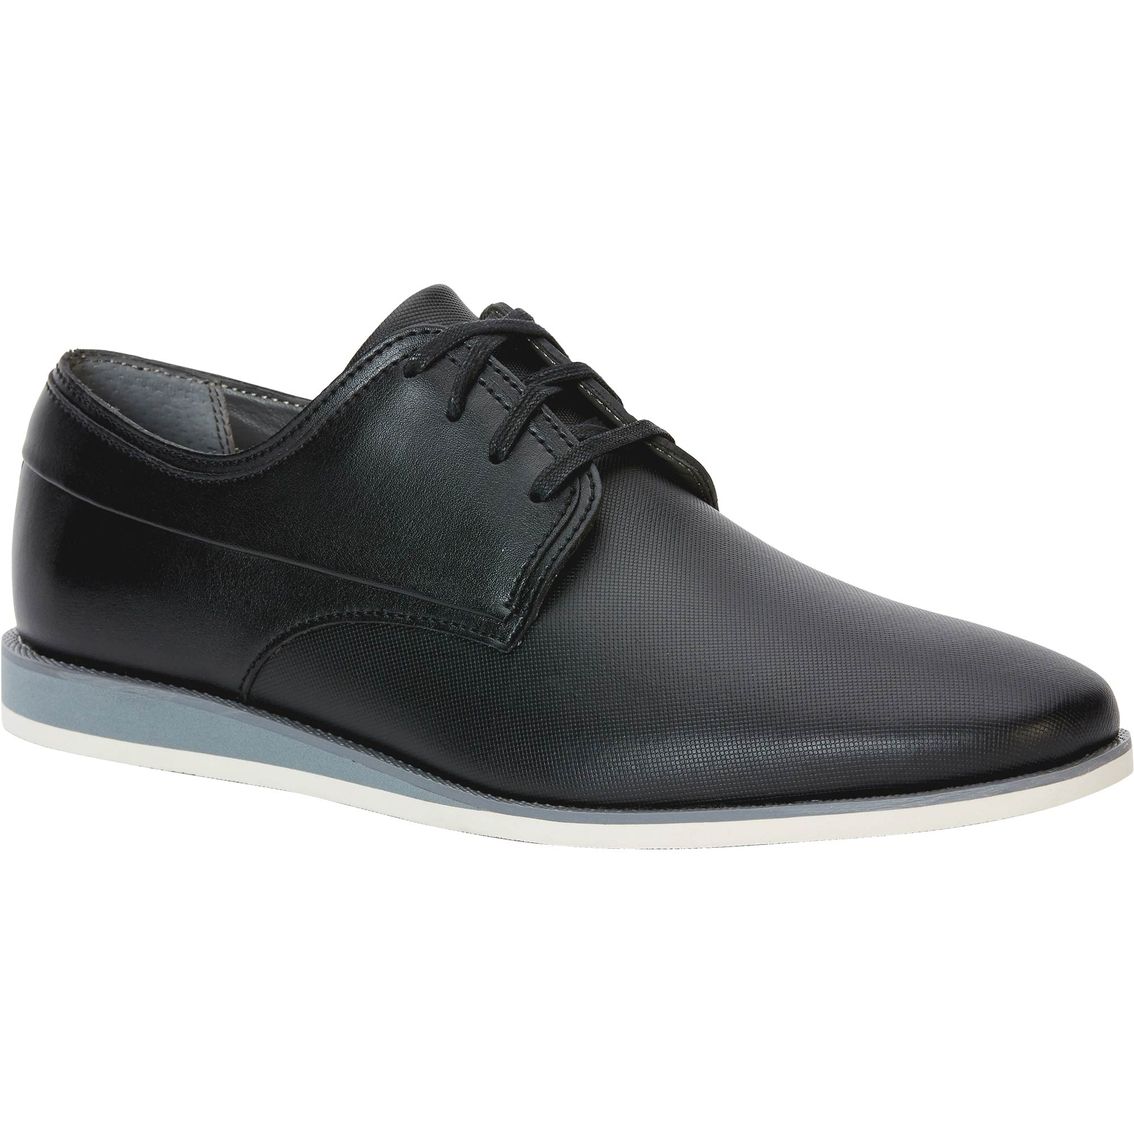 Calvin Klein Kellen Emboss Leather Dress Casual Sneakers